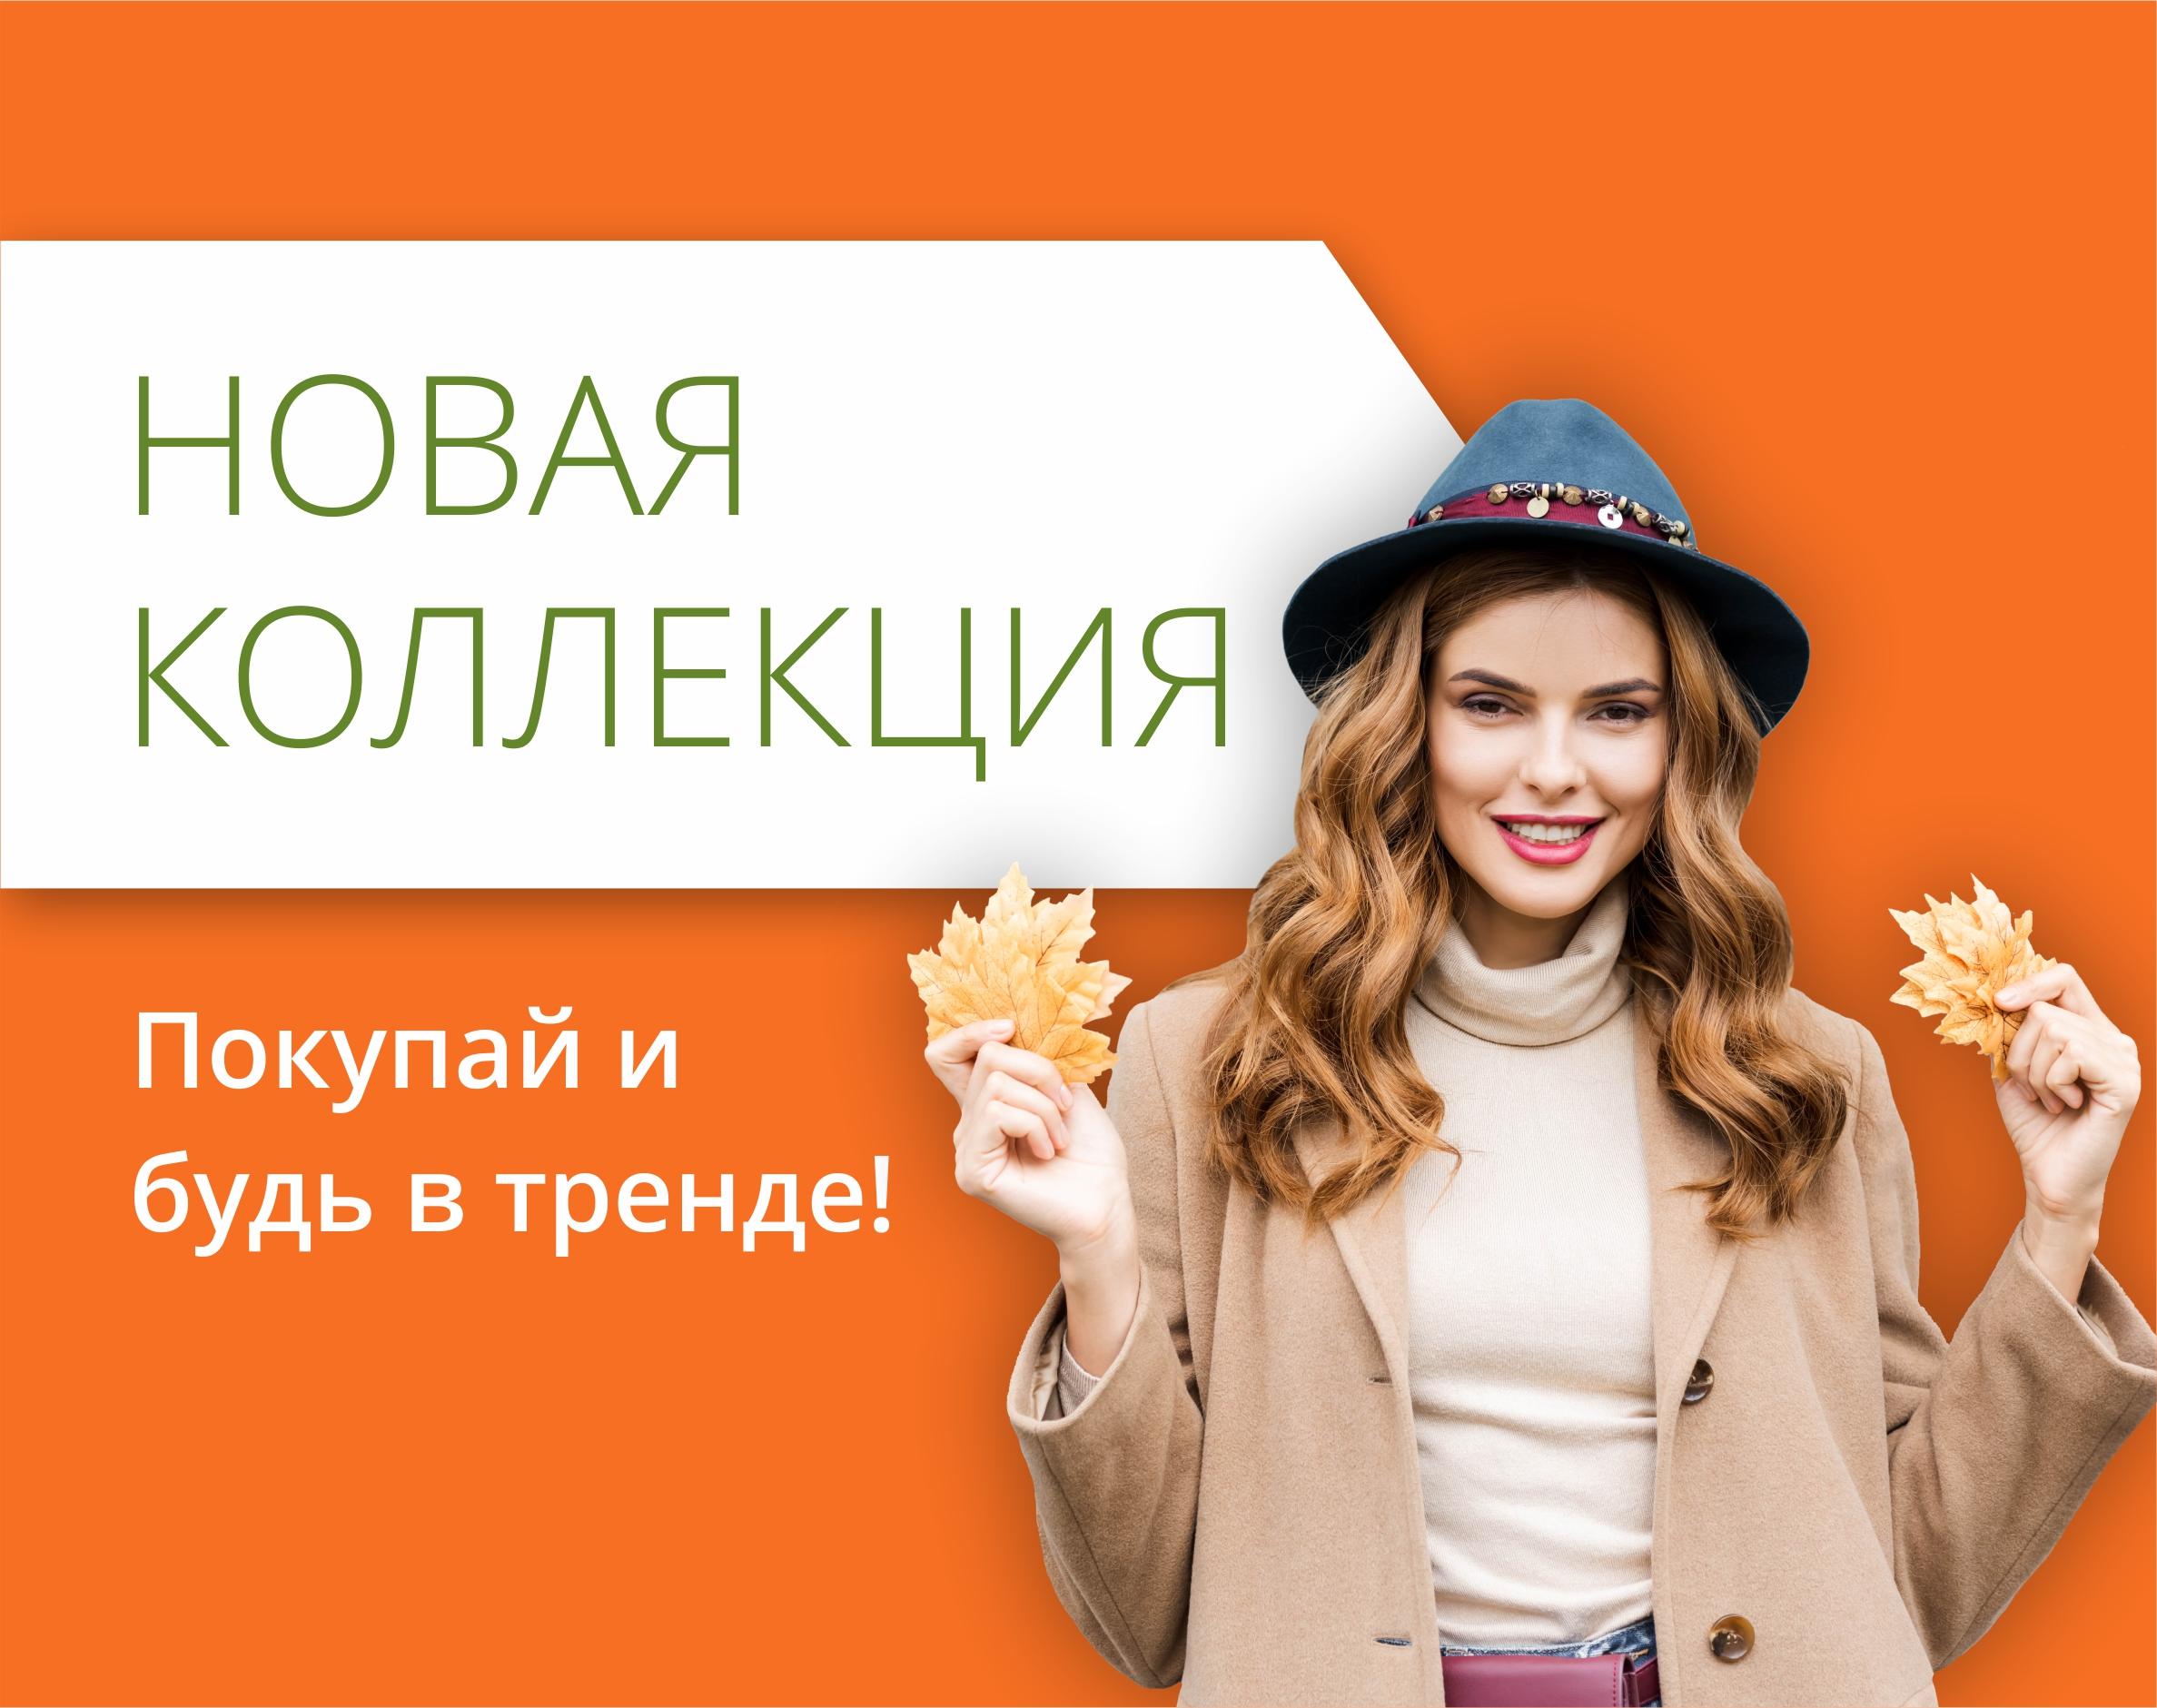 Новая осенняя коллекция в ТРЦ Любава!